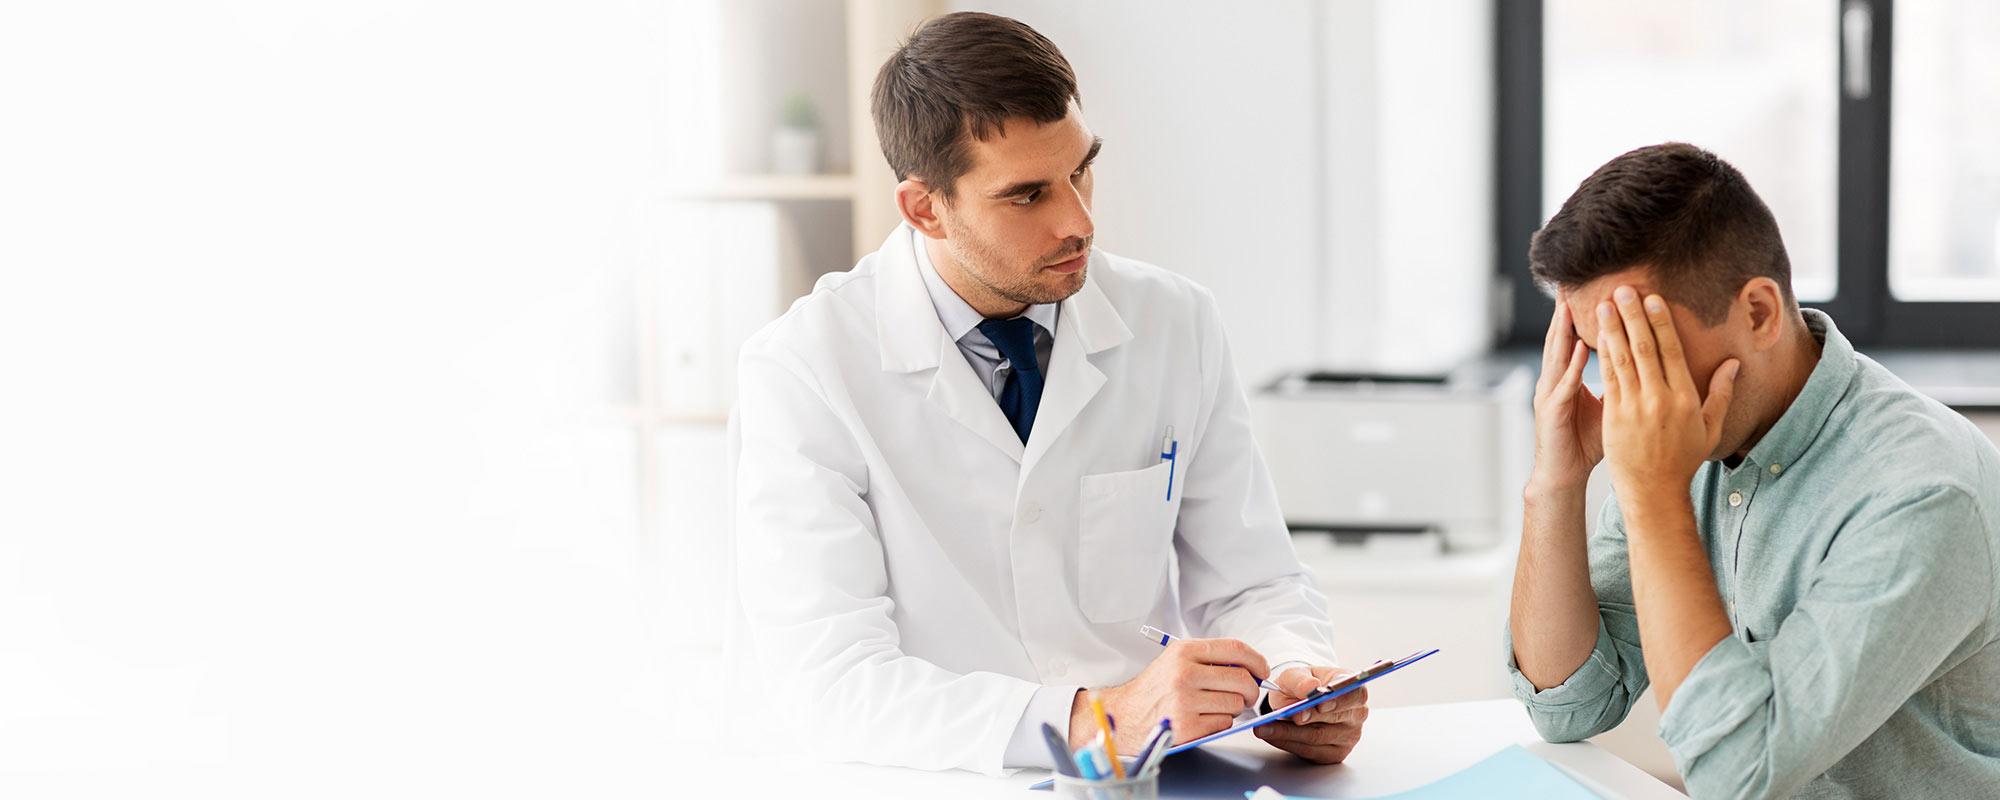 Ponad <span>50% chorych na migrenę</span>